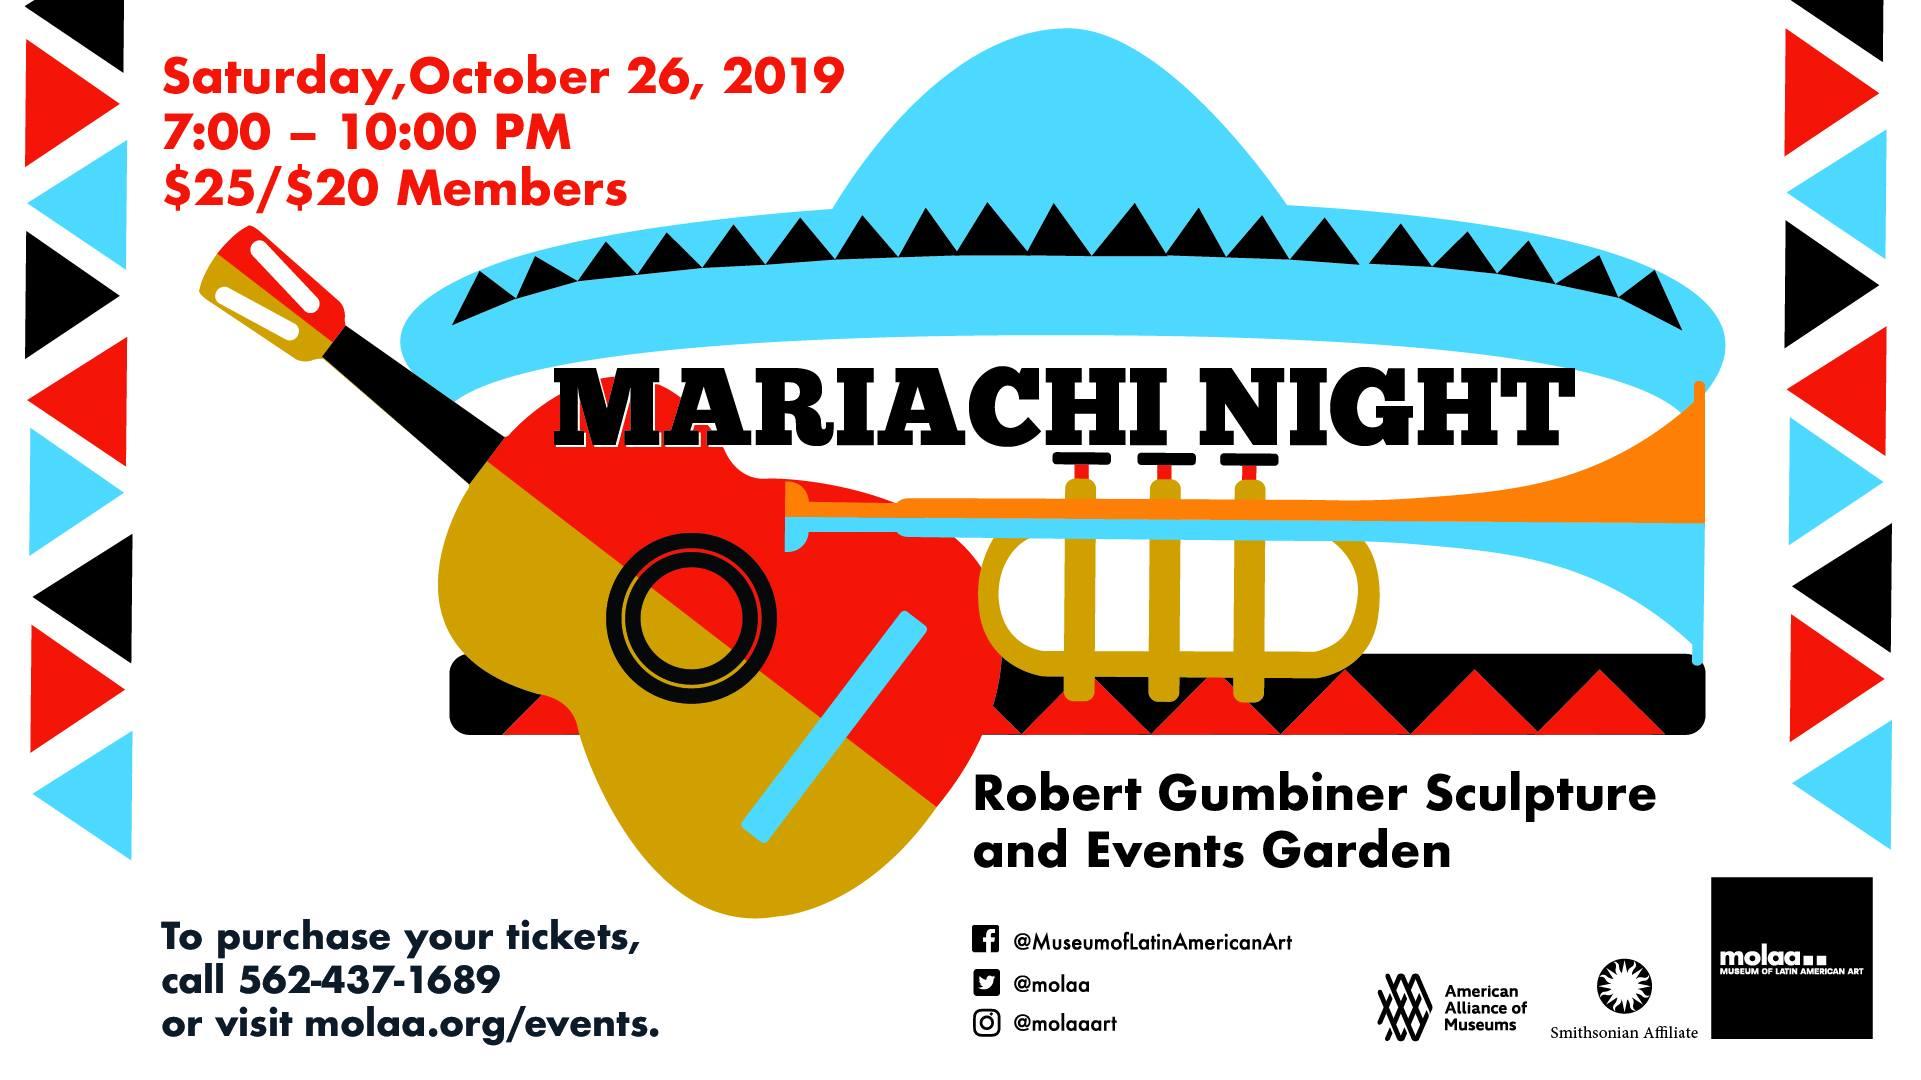 Mariachi Night